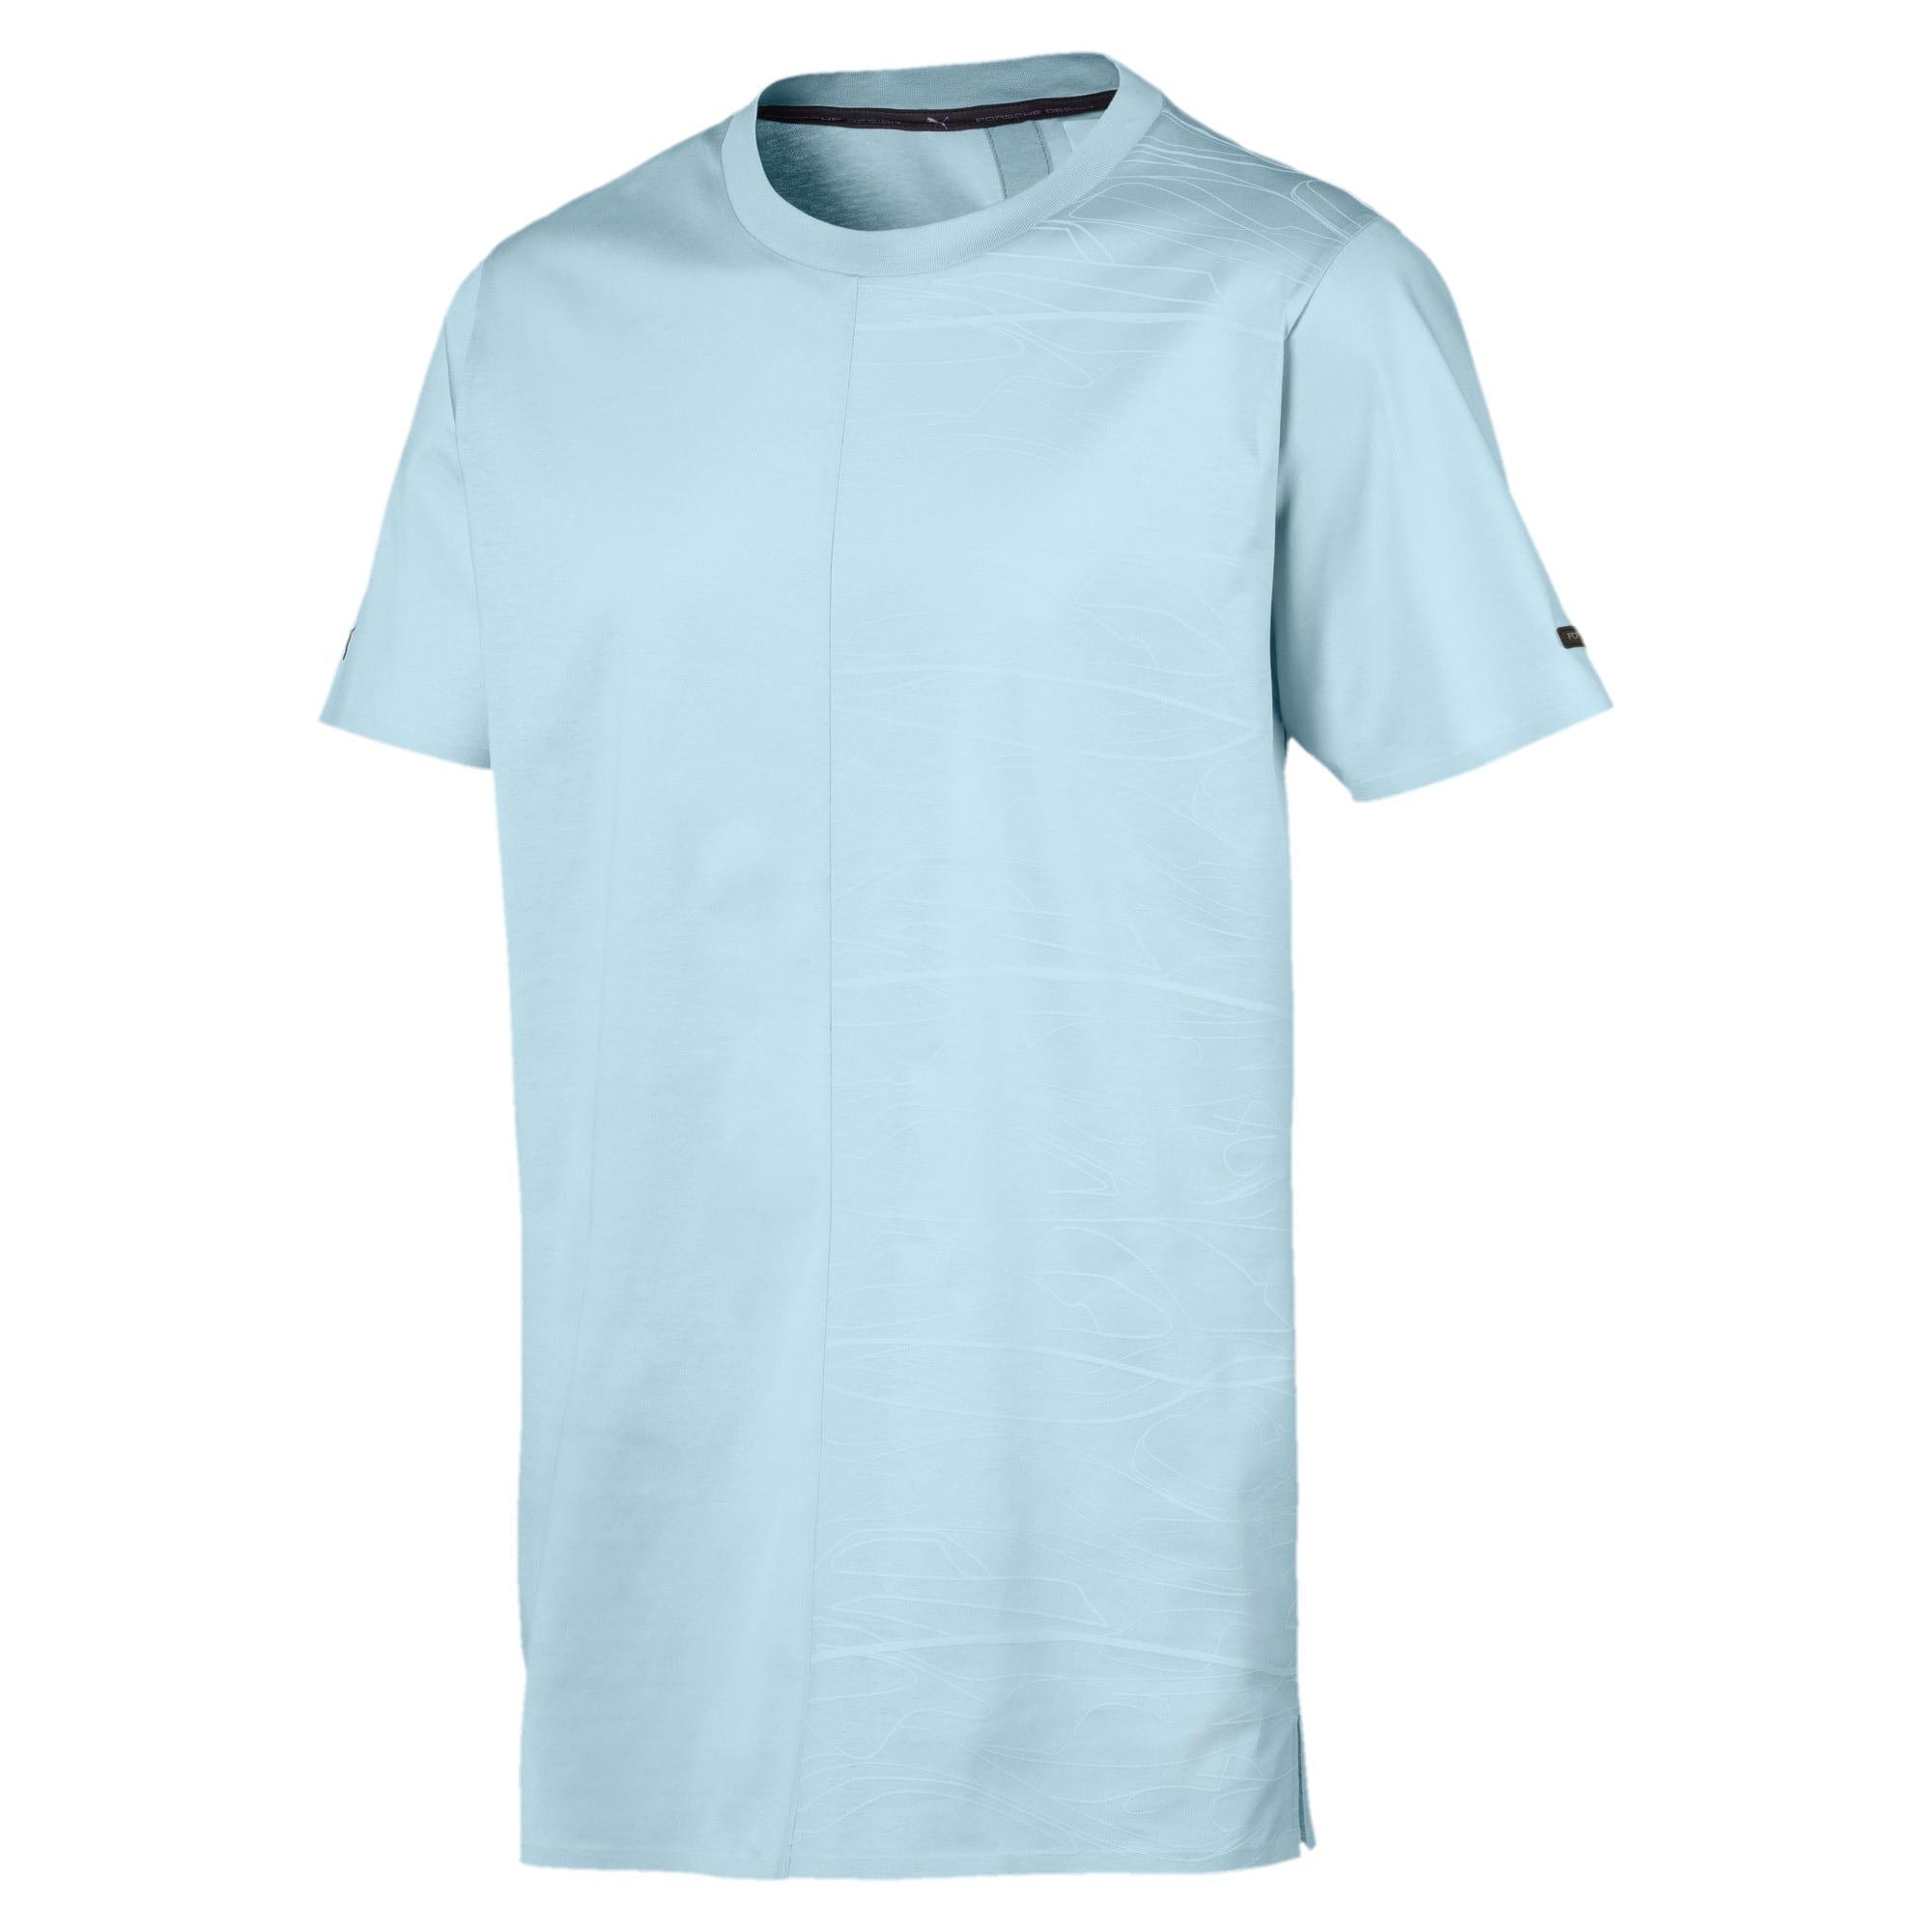 Thumbnail 1 of PORSCHE DESIGN  グラフィック Tシャツ, Light Sky, medium-JPN